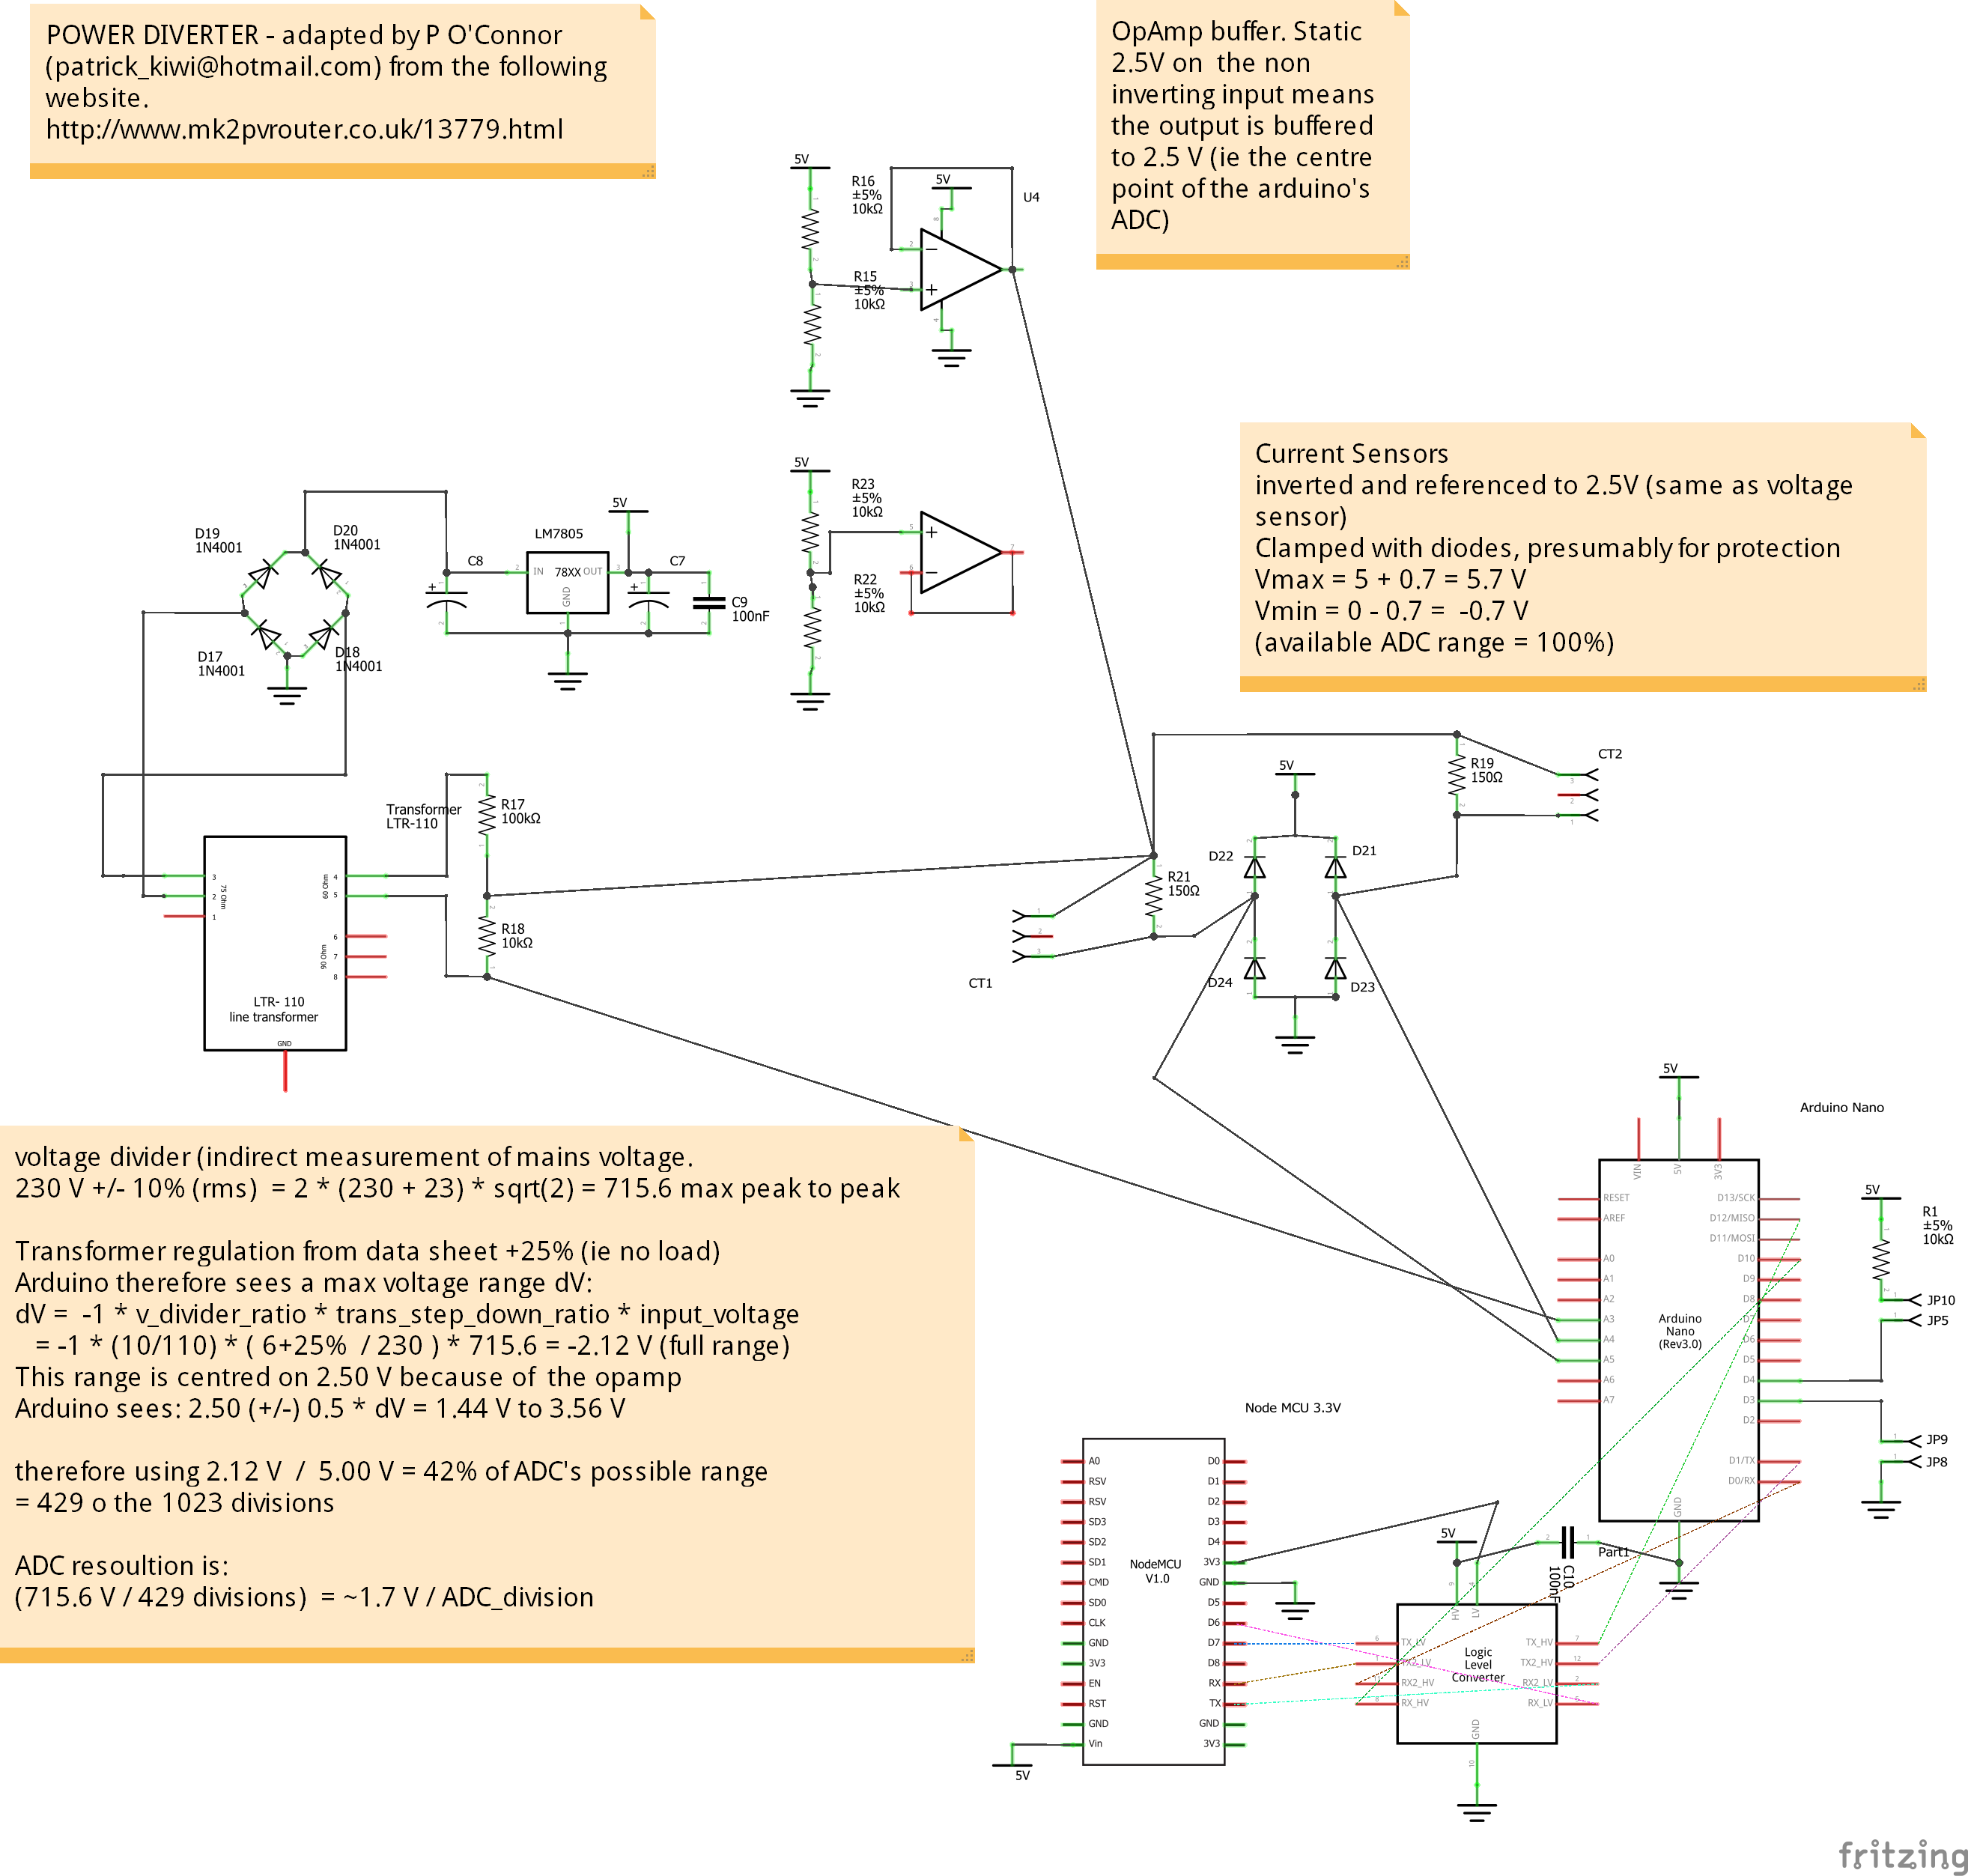 Arduino Nano ESP8266 MK2 PV router hybrid - Hardware - Community